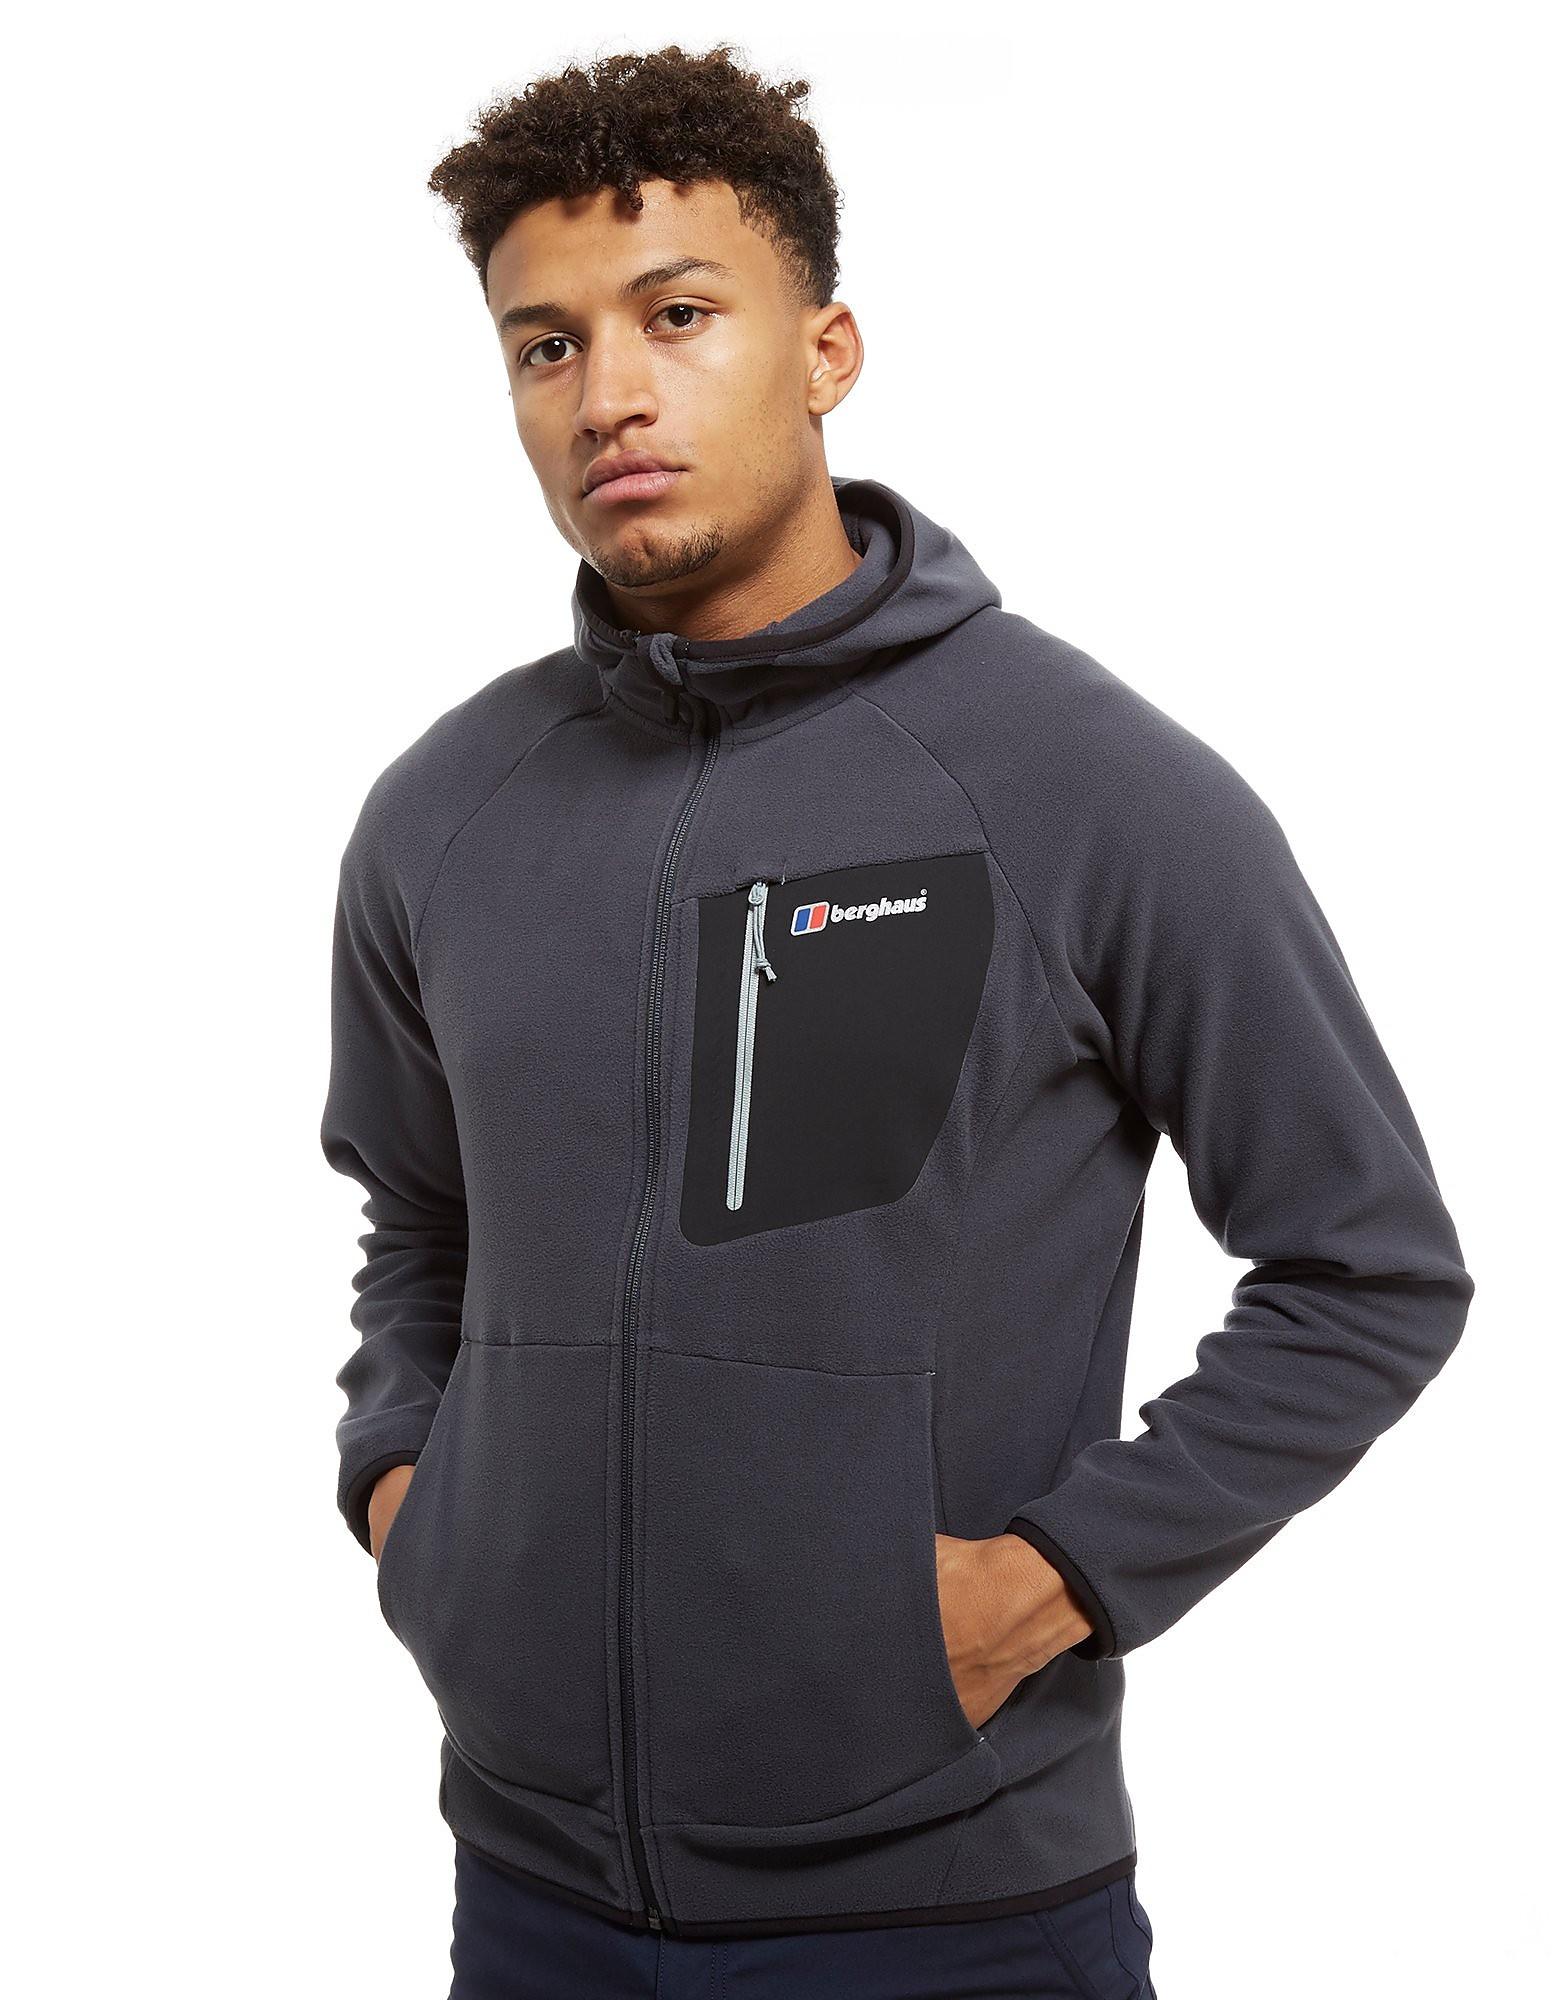 Berghaus Deception Hooded Full Zip Fleece Jacket